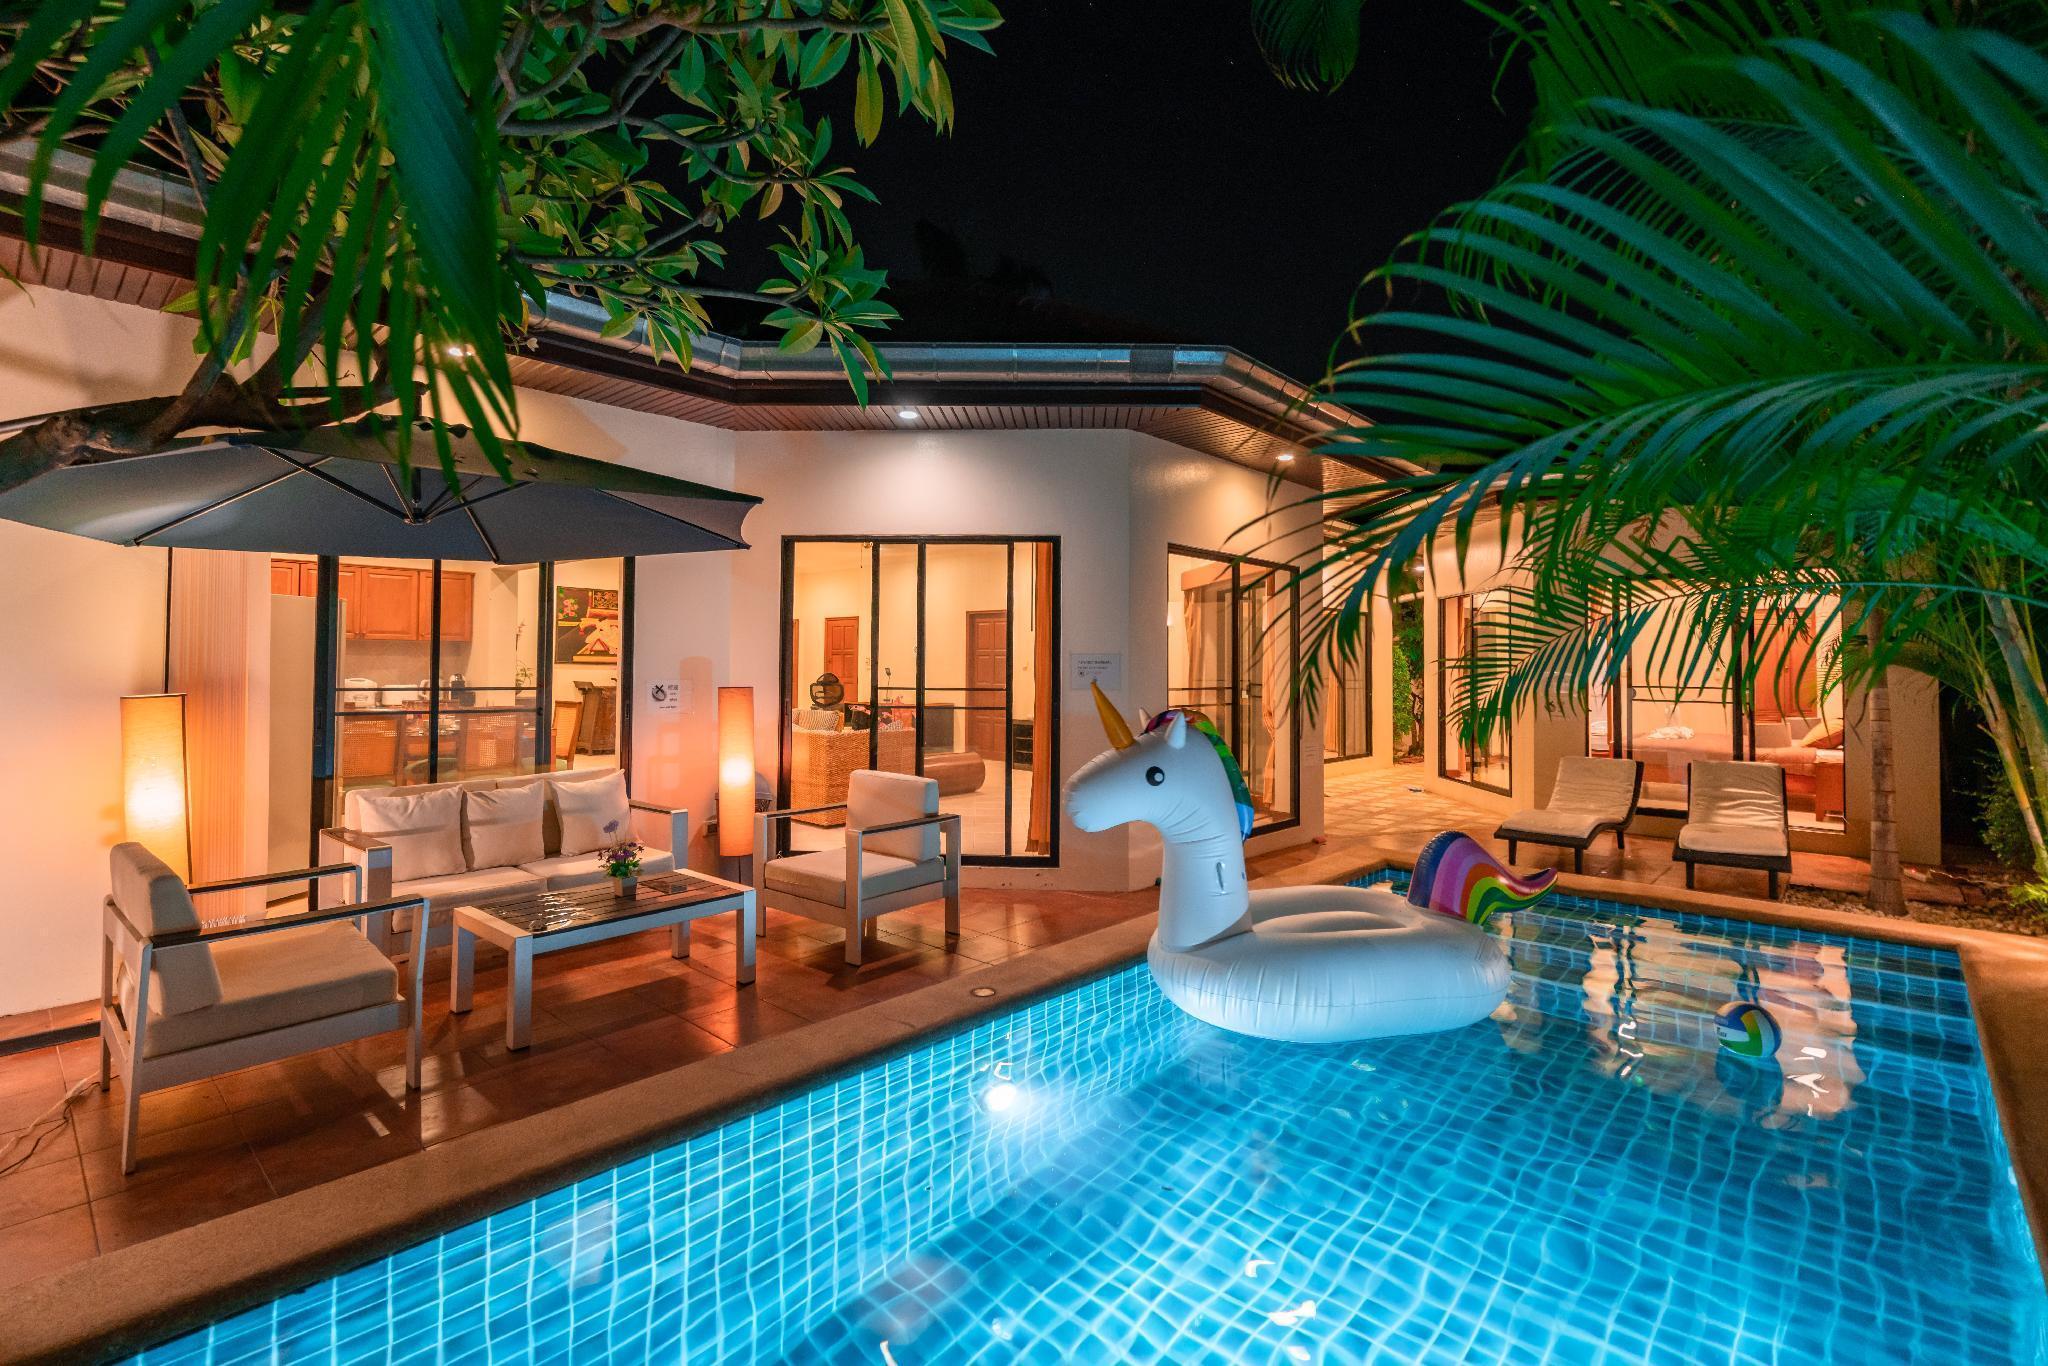 view talay villas,jomtien beach 500M วิลลา 4 ห้องนอน 3 ห้องน้ำส่วนตัว ขนาด 300 ตร.ม. – หาดจอมเทียน